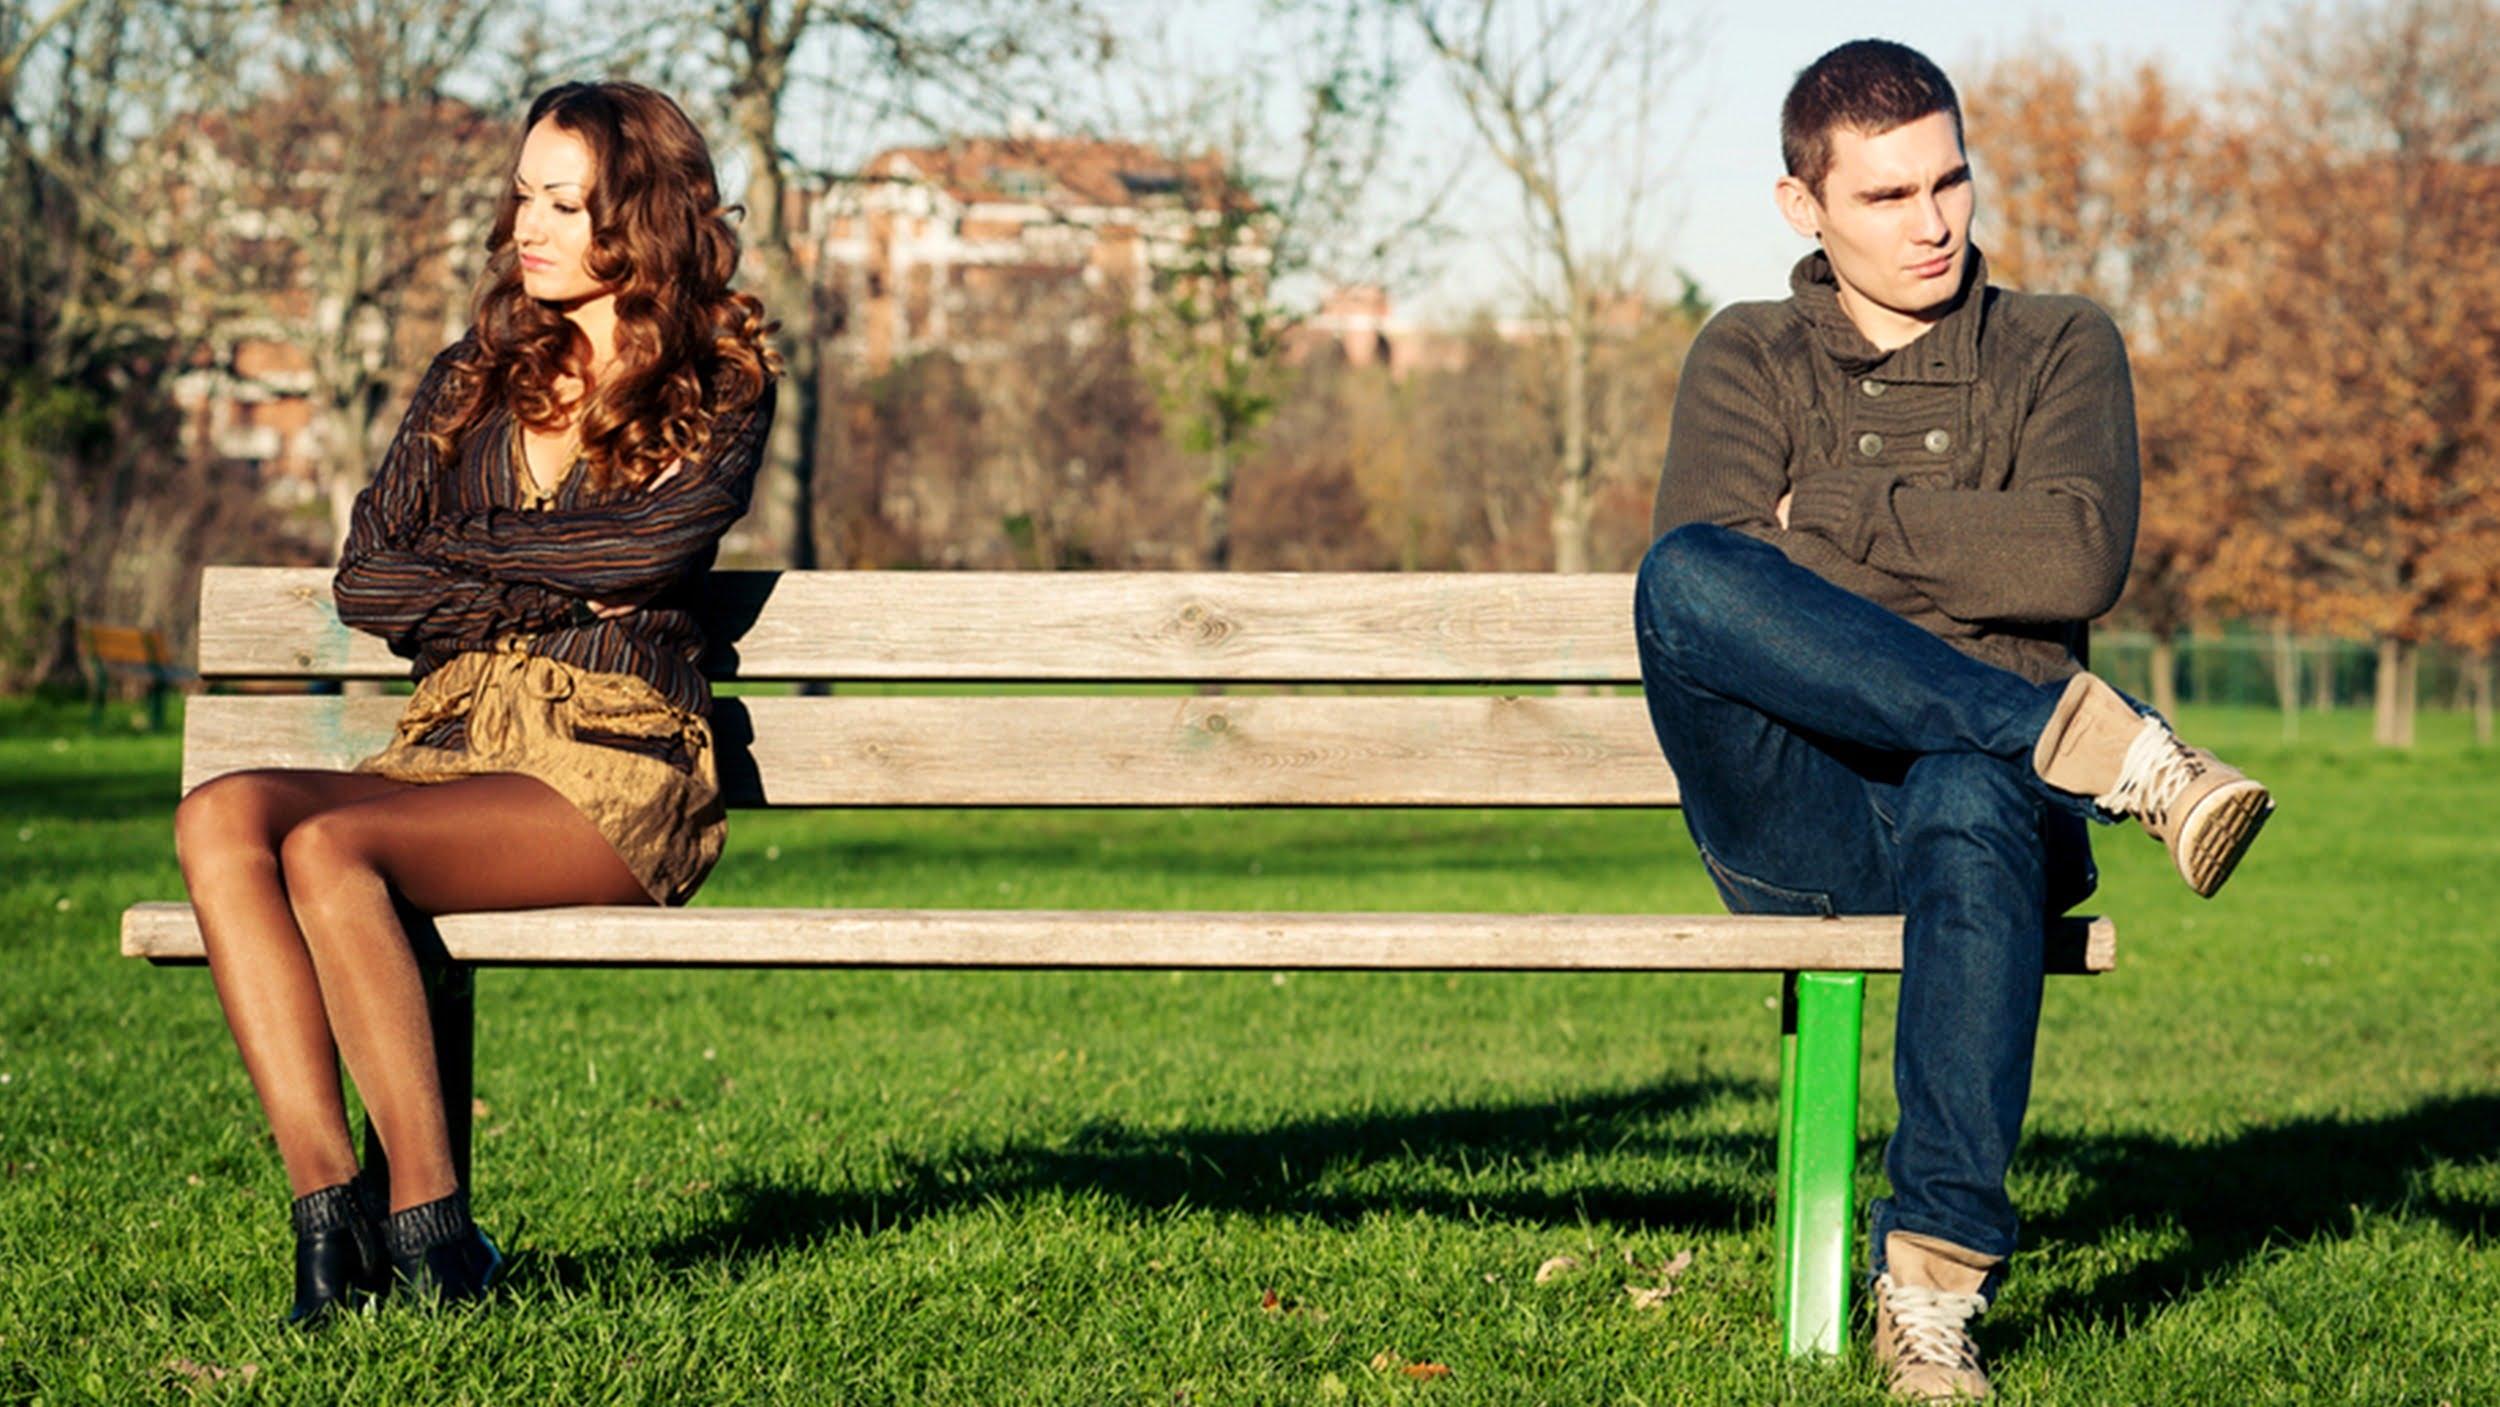 Marital disagreements